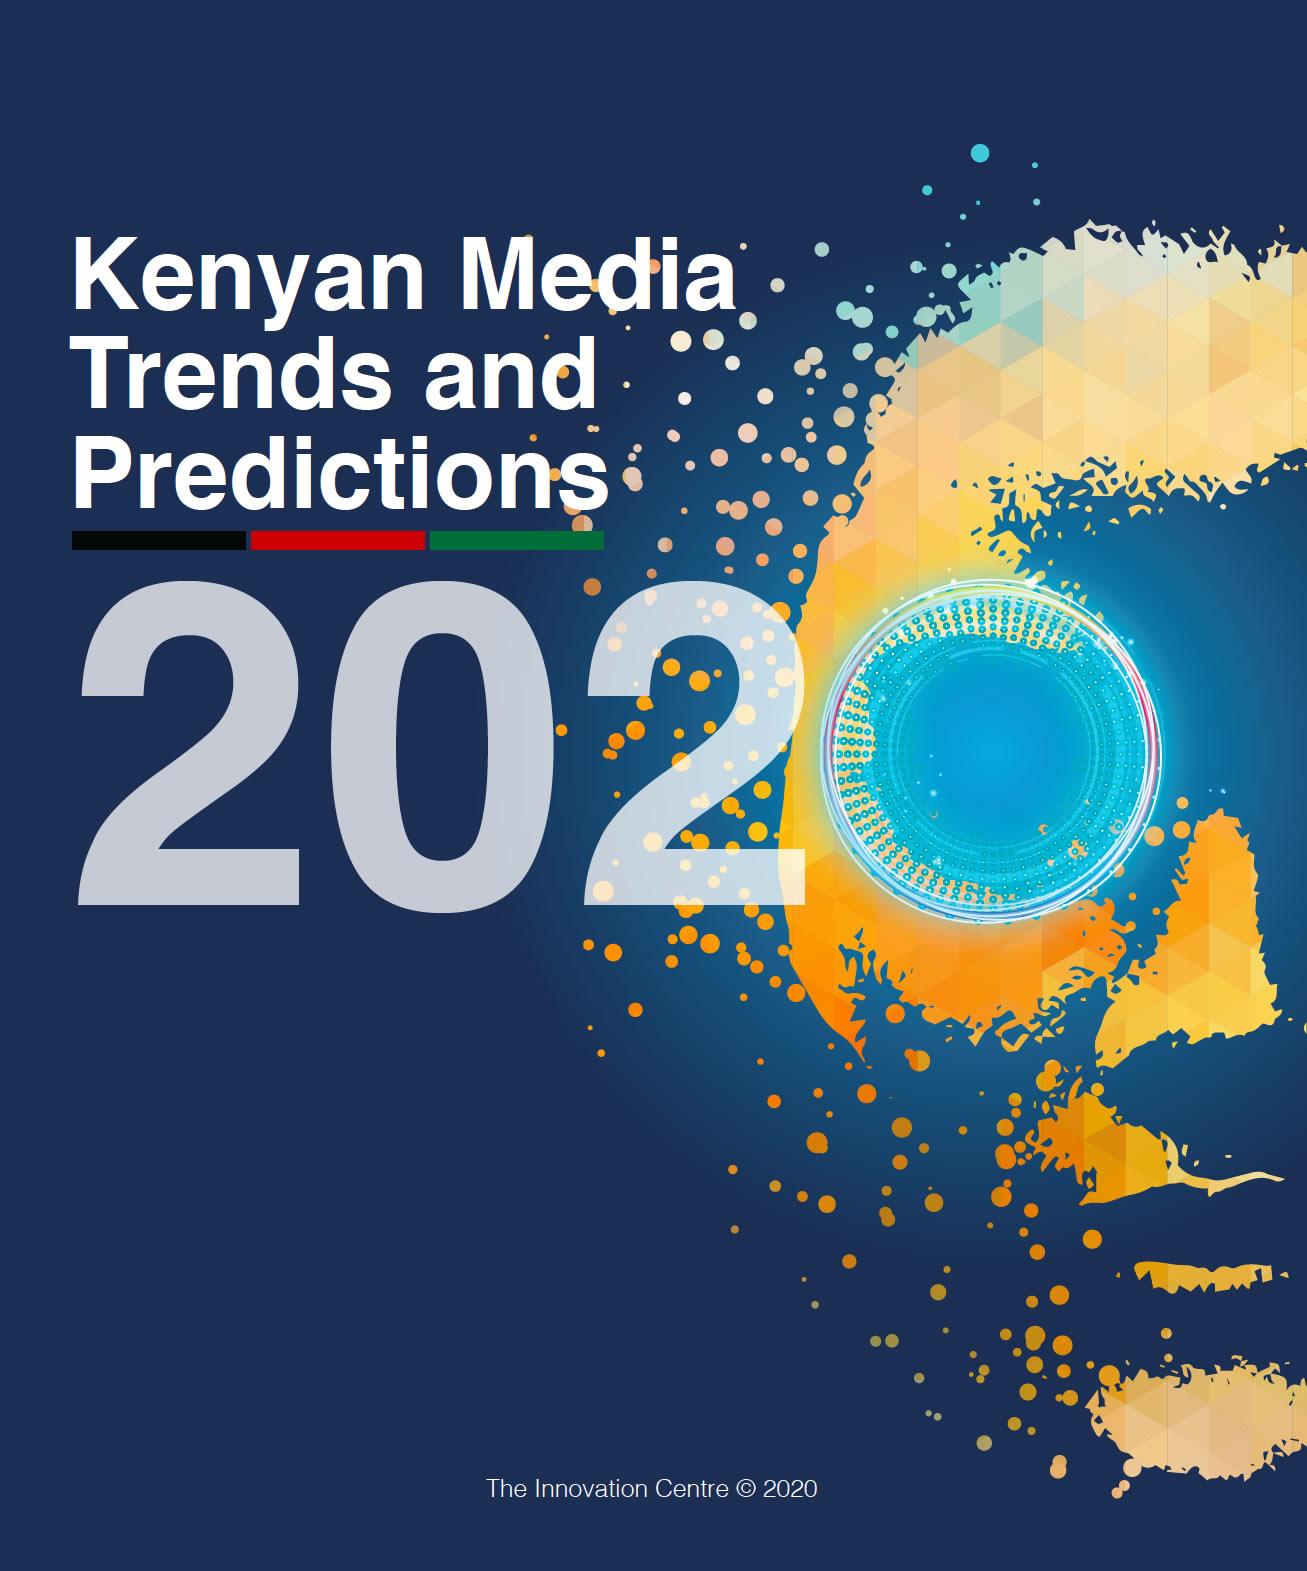 Kenyan media trends and predictions